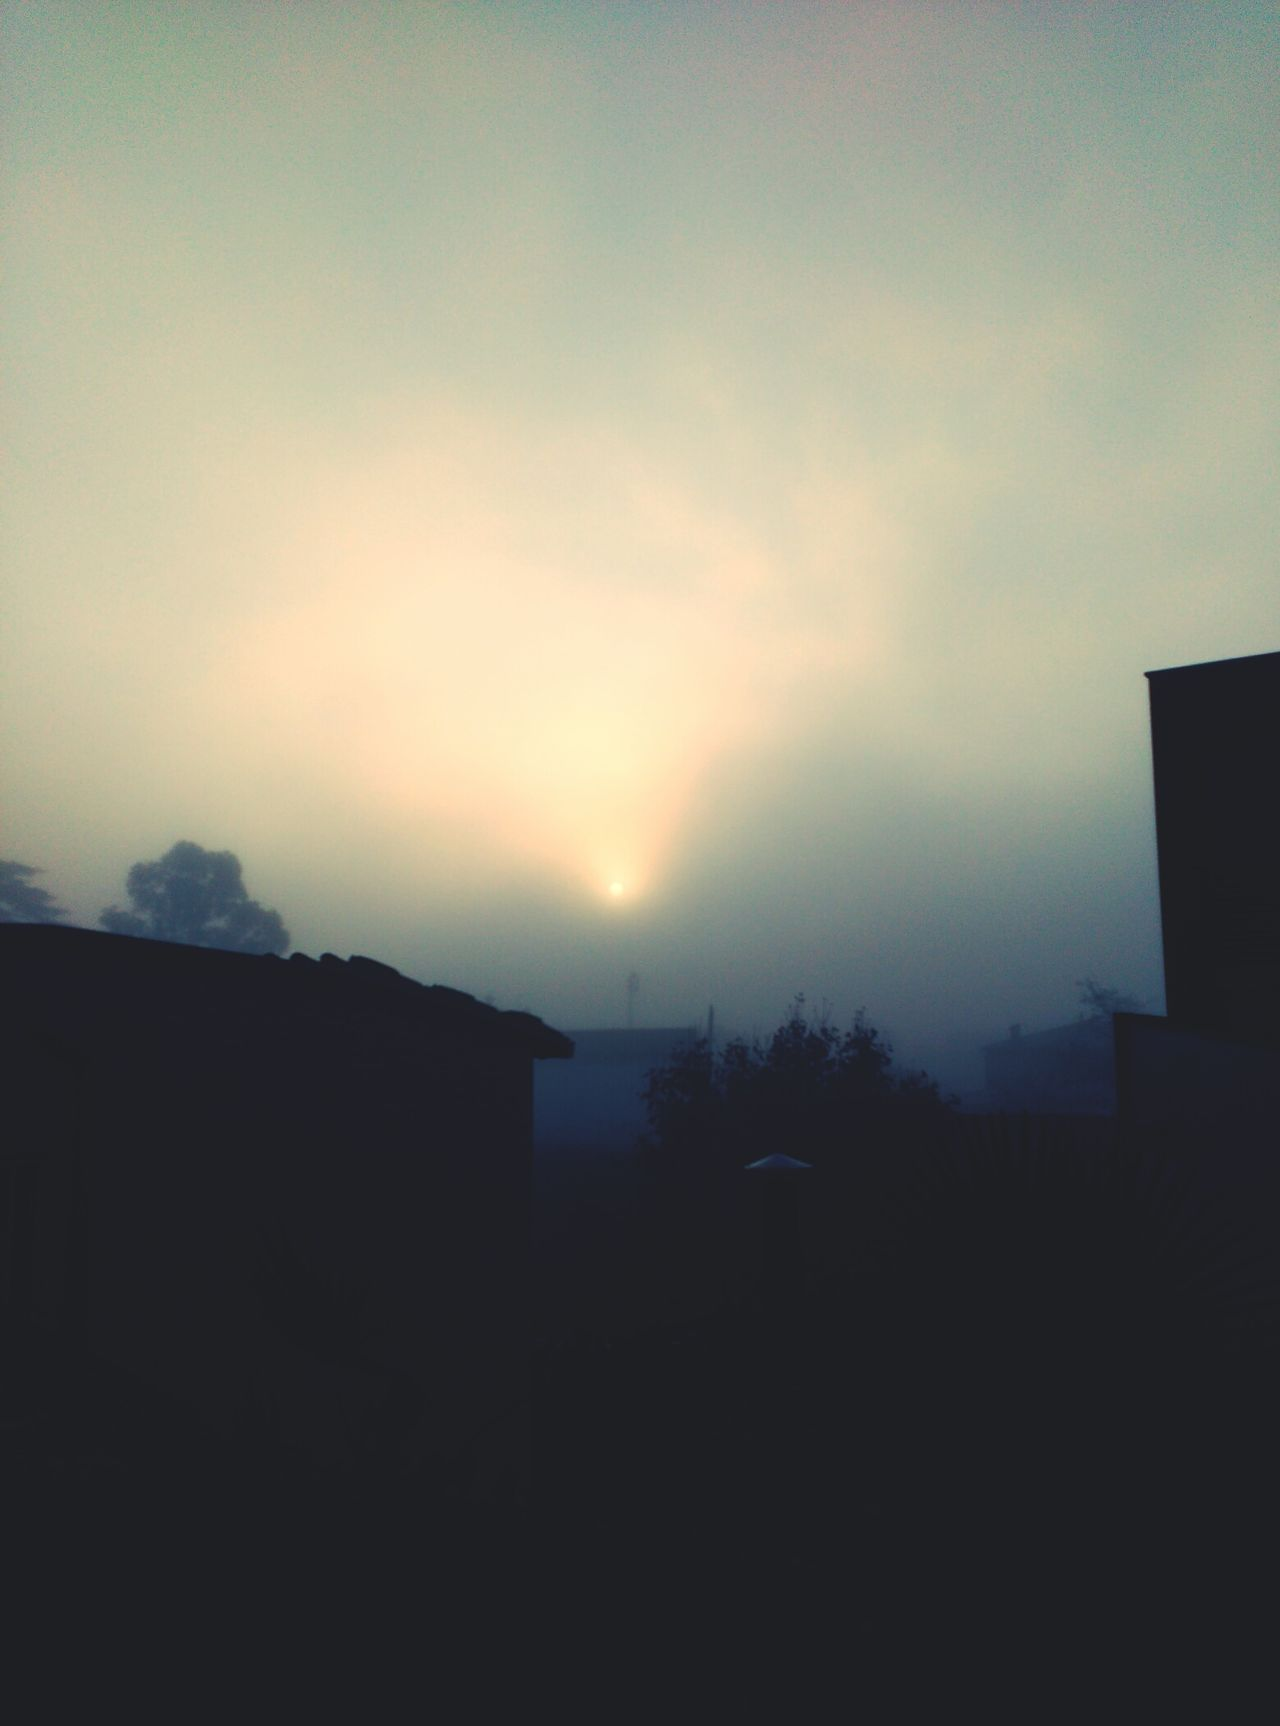 Un dia fred 09:00h am Silhouette Sunset Nature Sky Sunlight Cold Winter ❄⛄ Wintertime Frio ⛄❄ Freddo Polare!😆 Llums Lightofthesun